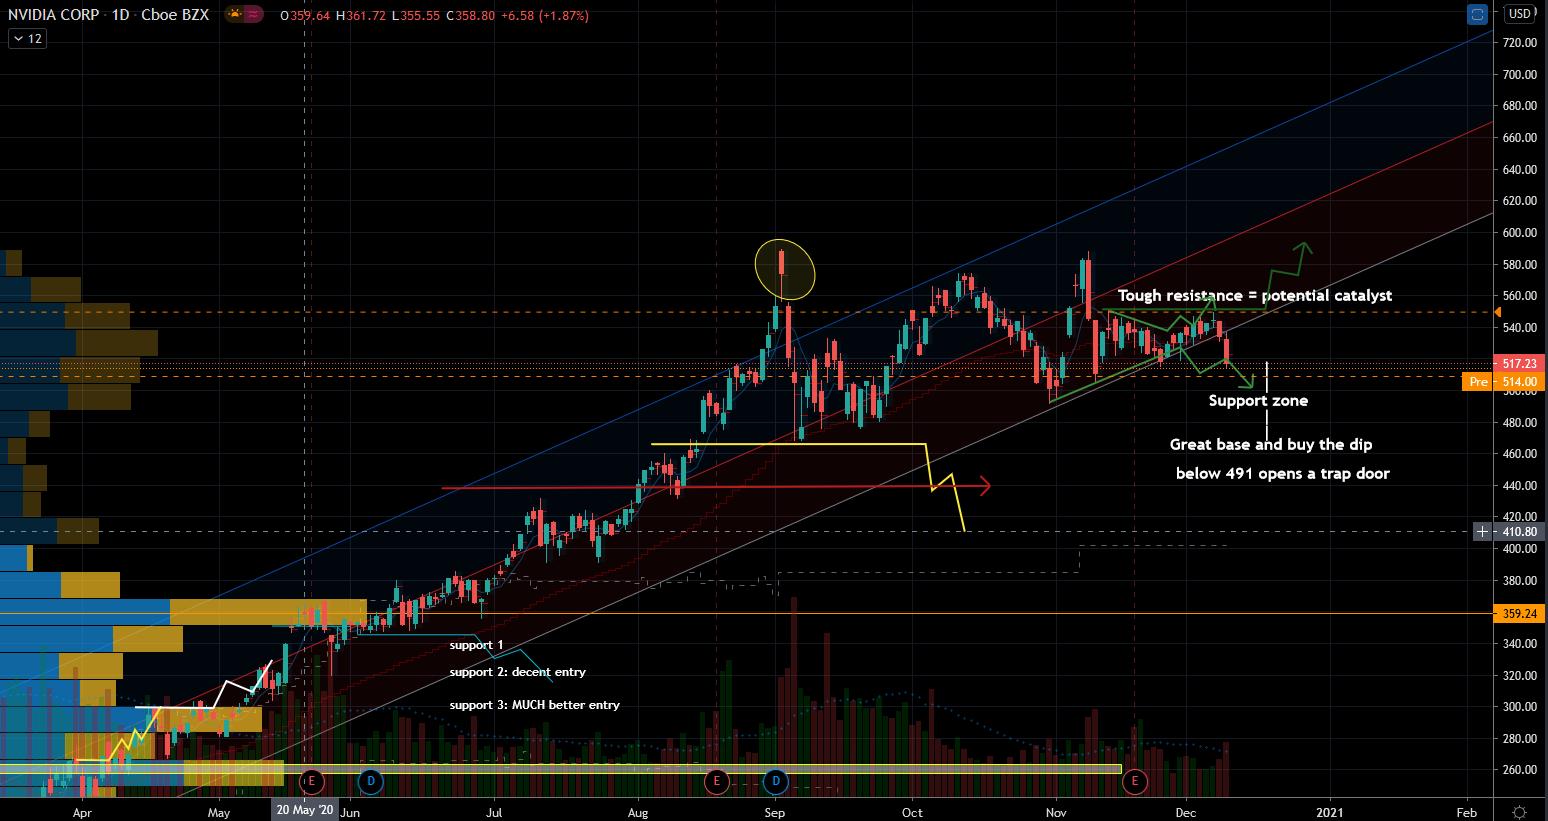 Undervalued stocks: Nvidia (NVDA) Stock Chart Showing Room for Upside Swing